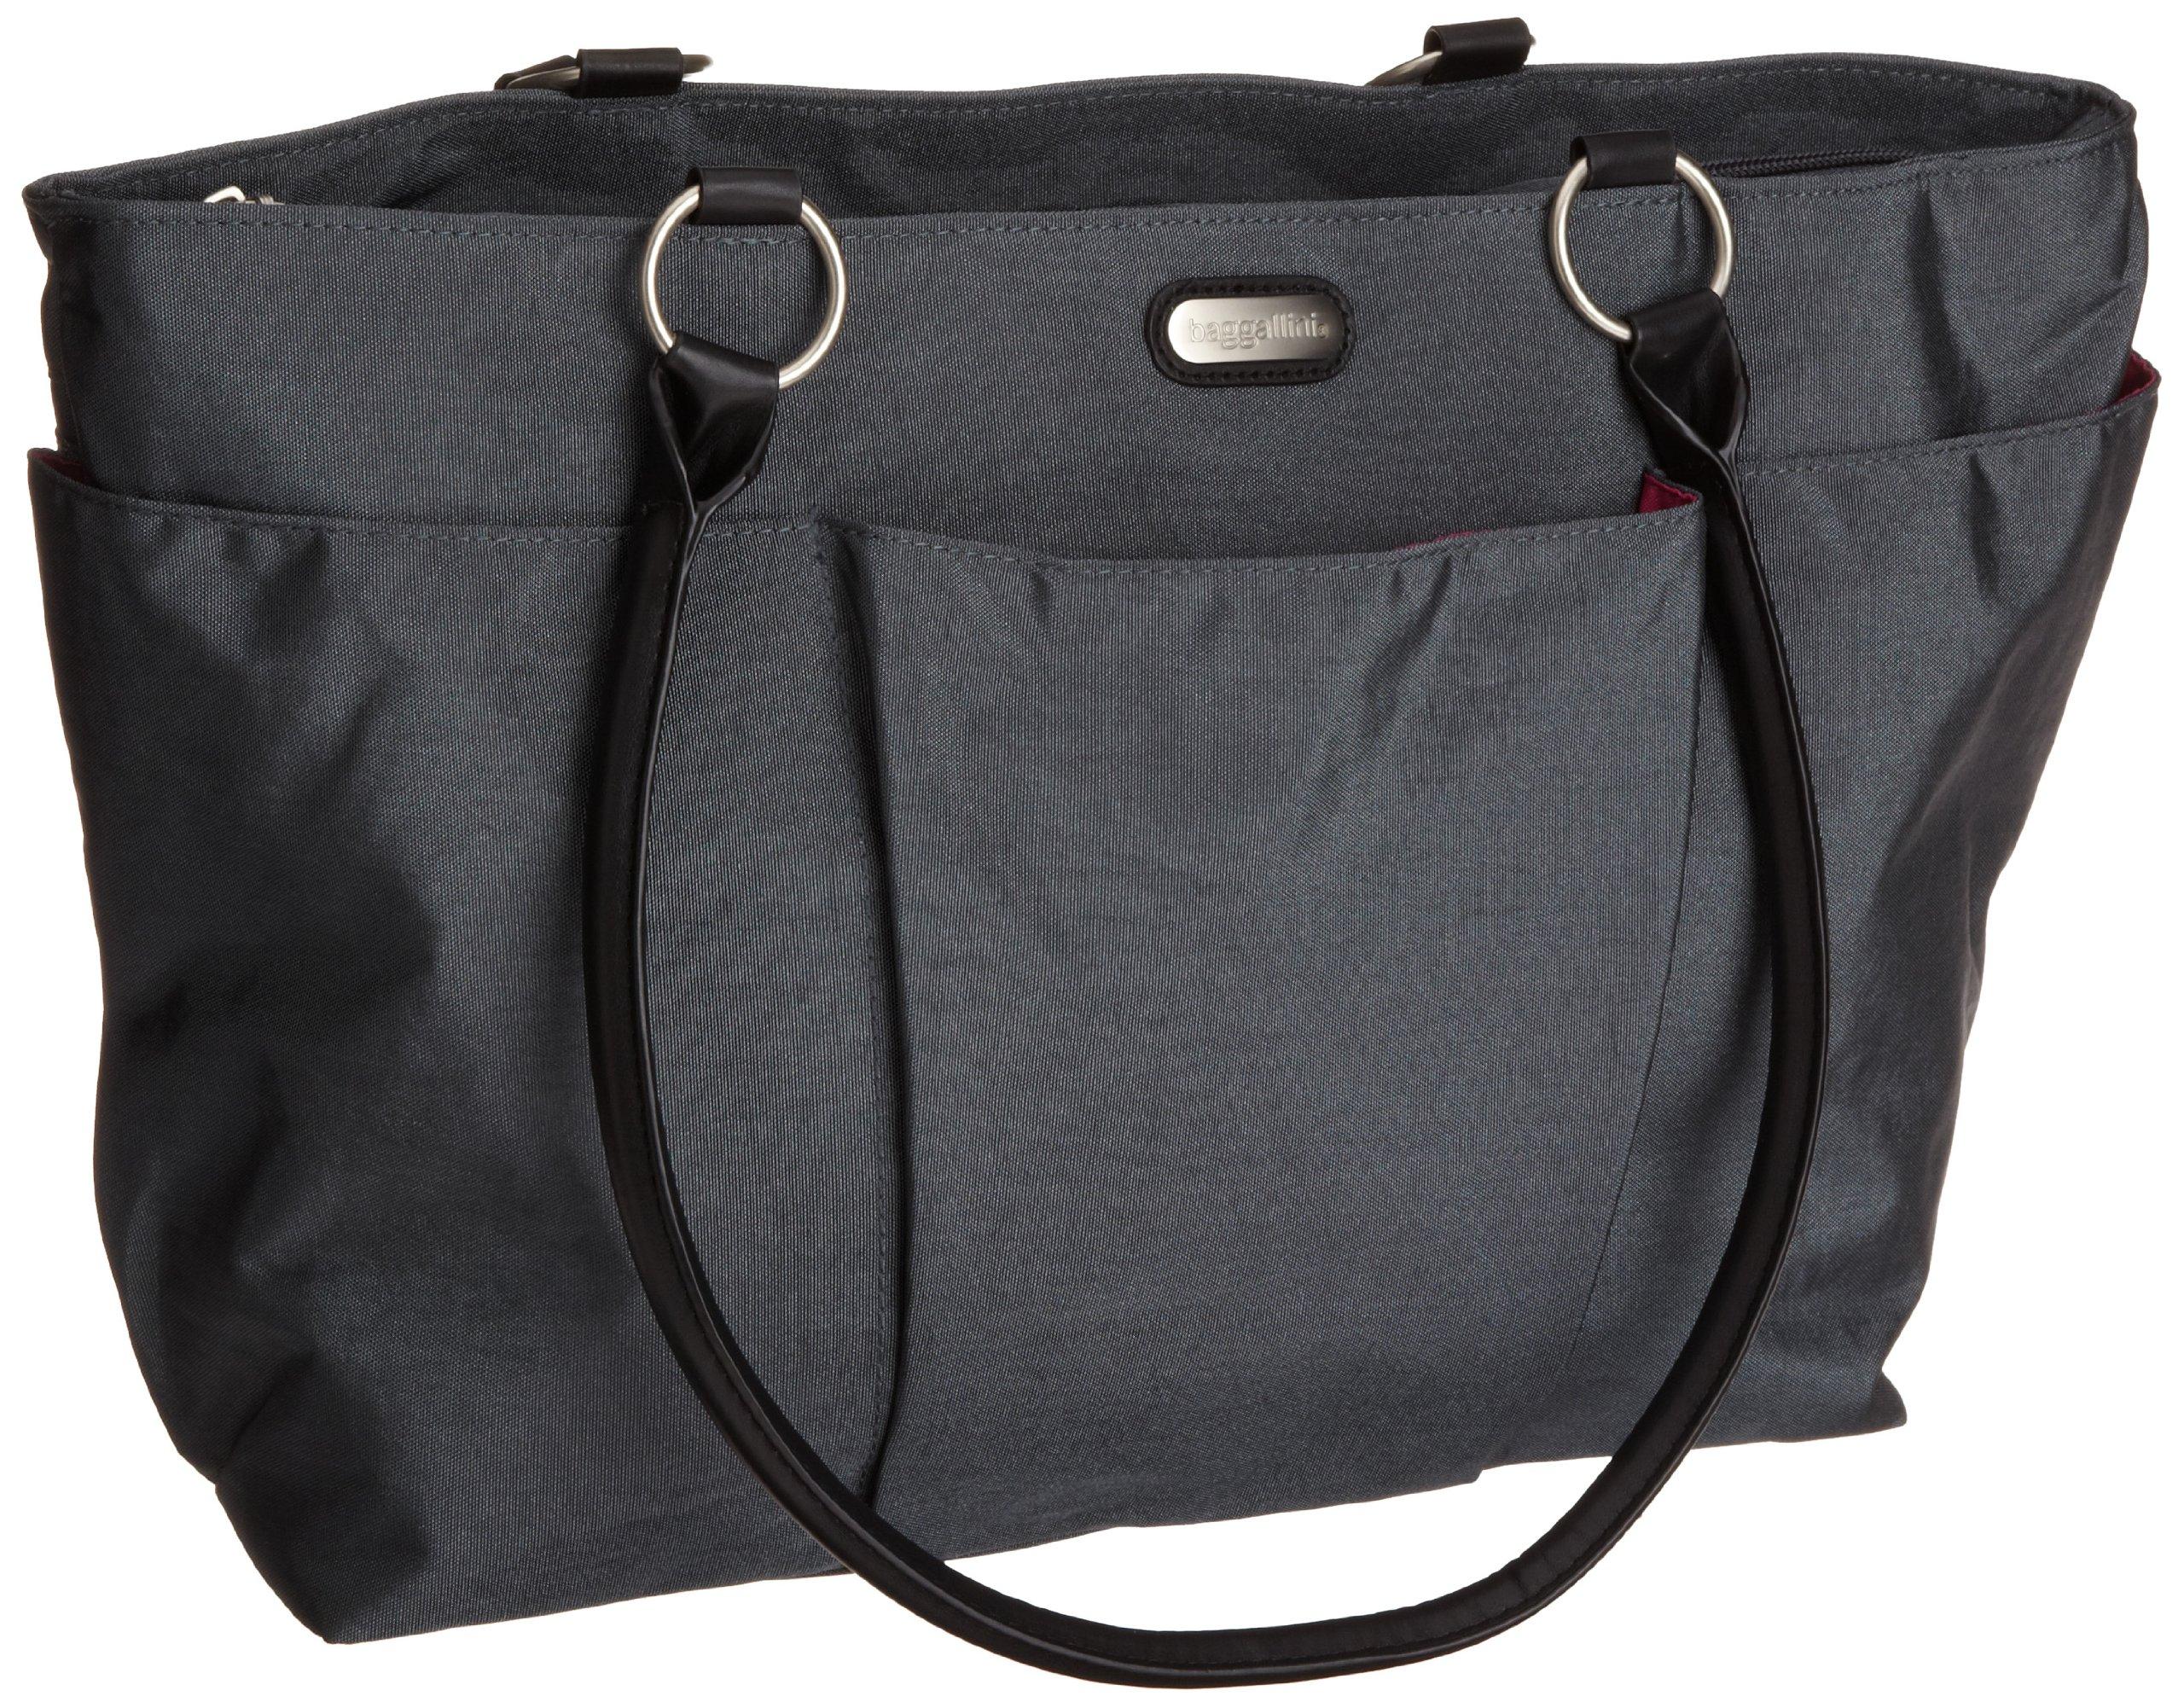 Baggallini Luggage Ala Carte Bag, Graphite, One Size